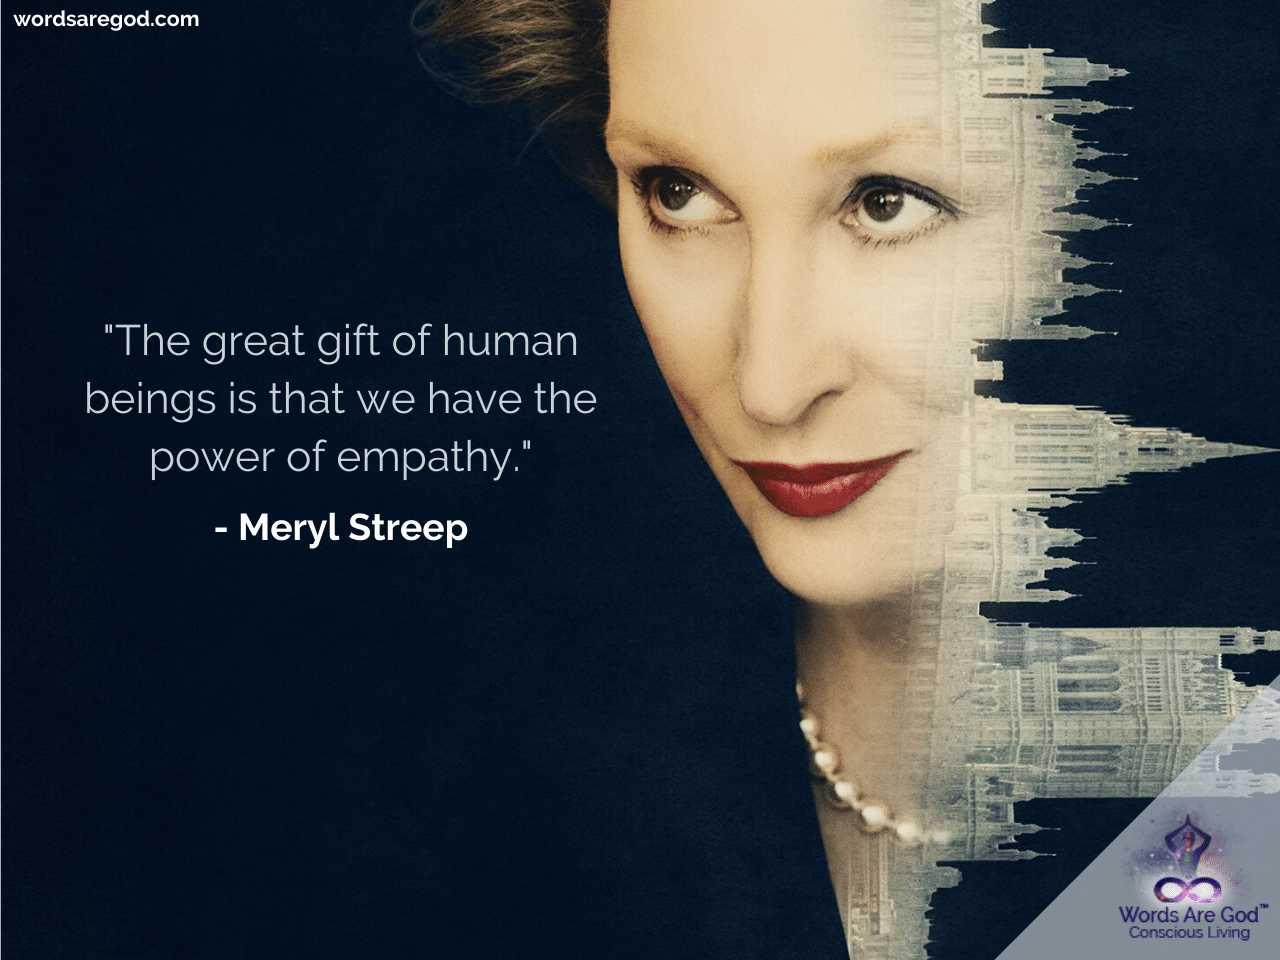 Meryl streep Inspirational Quotes by Meryl Streep